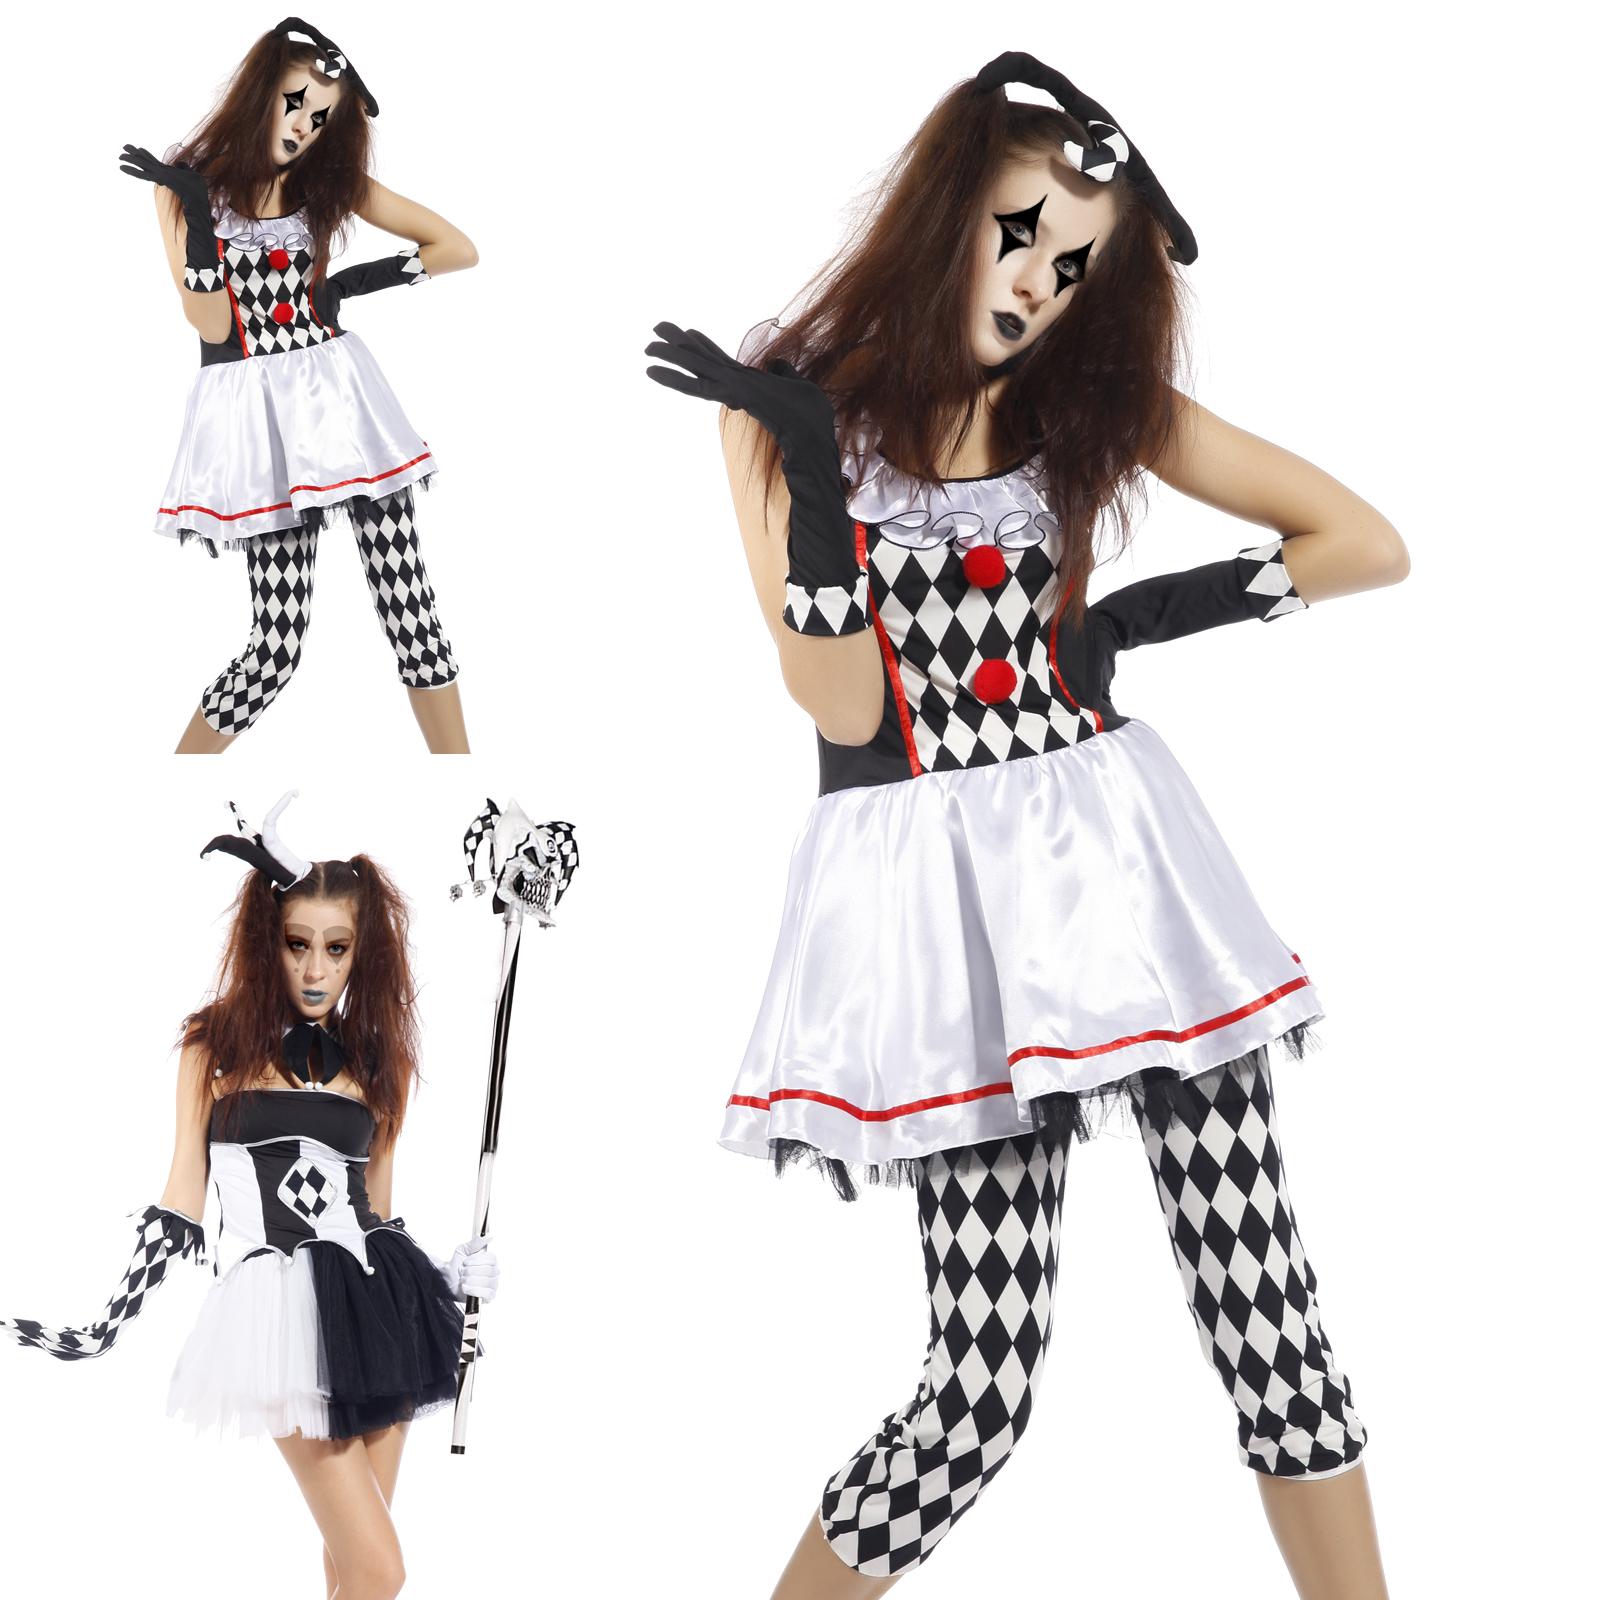 damen evil clown harley quinn kost m harlekin hofnarr. Black Bedroom Furniture Sets. Home Design Ideas